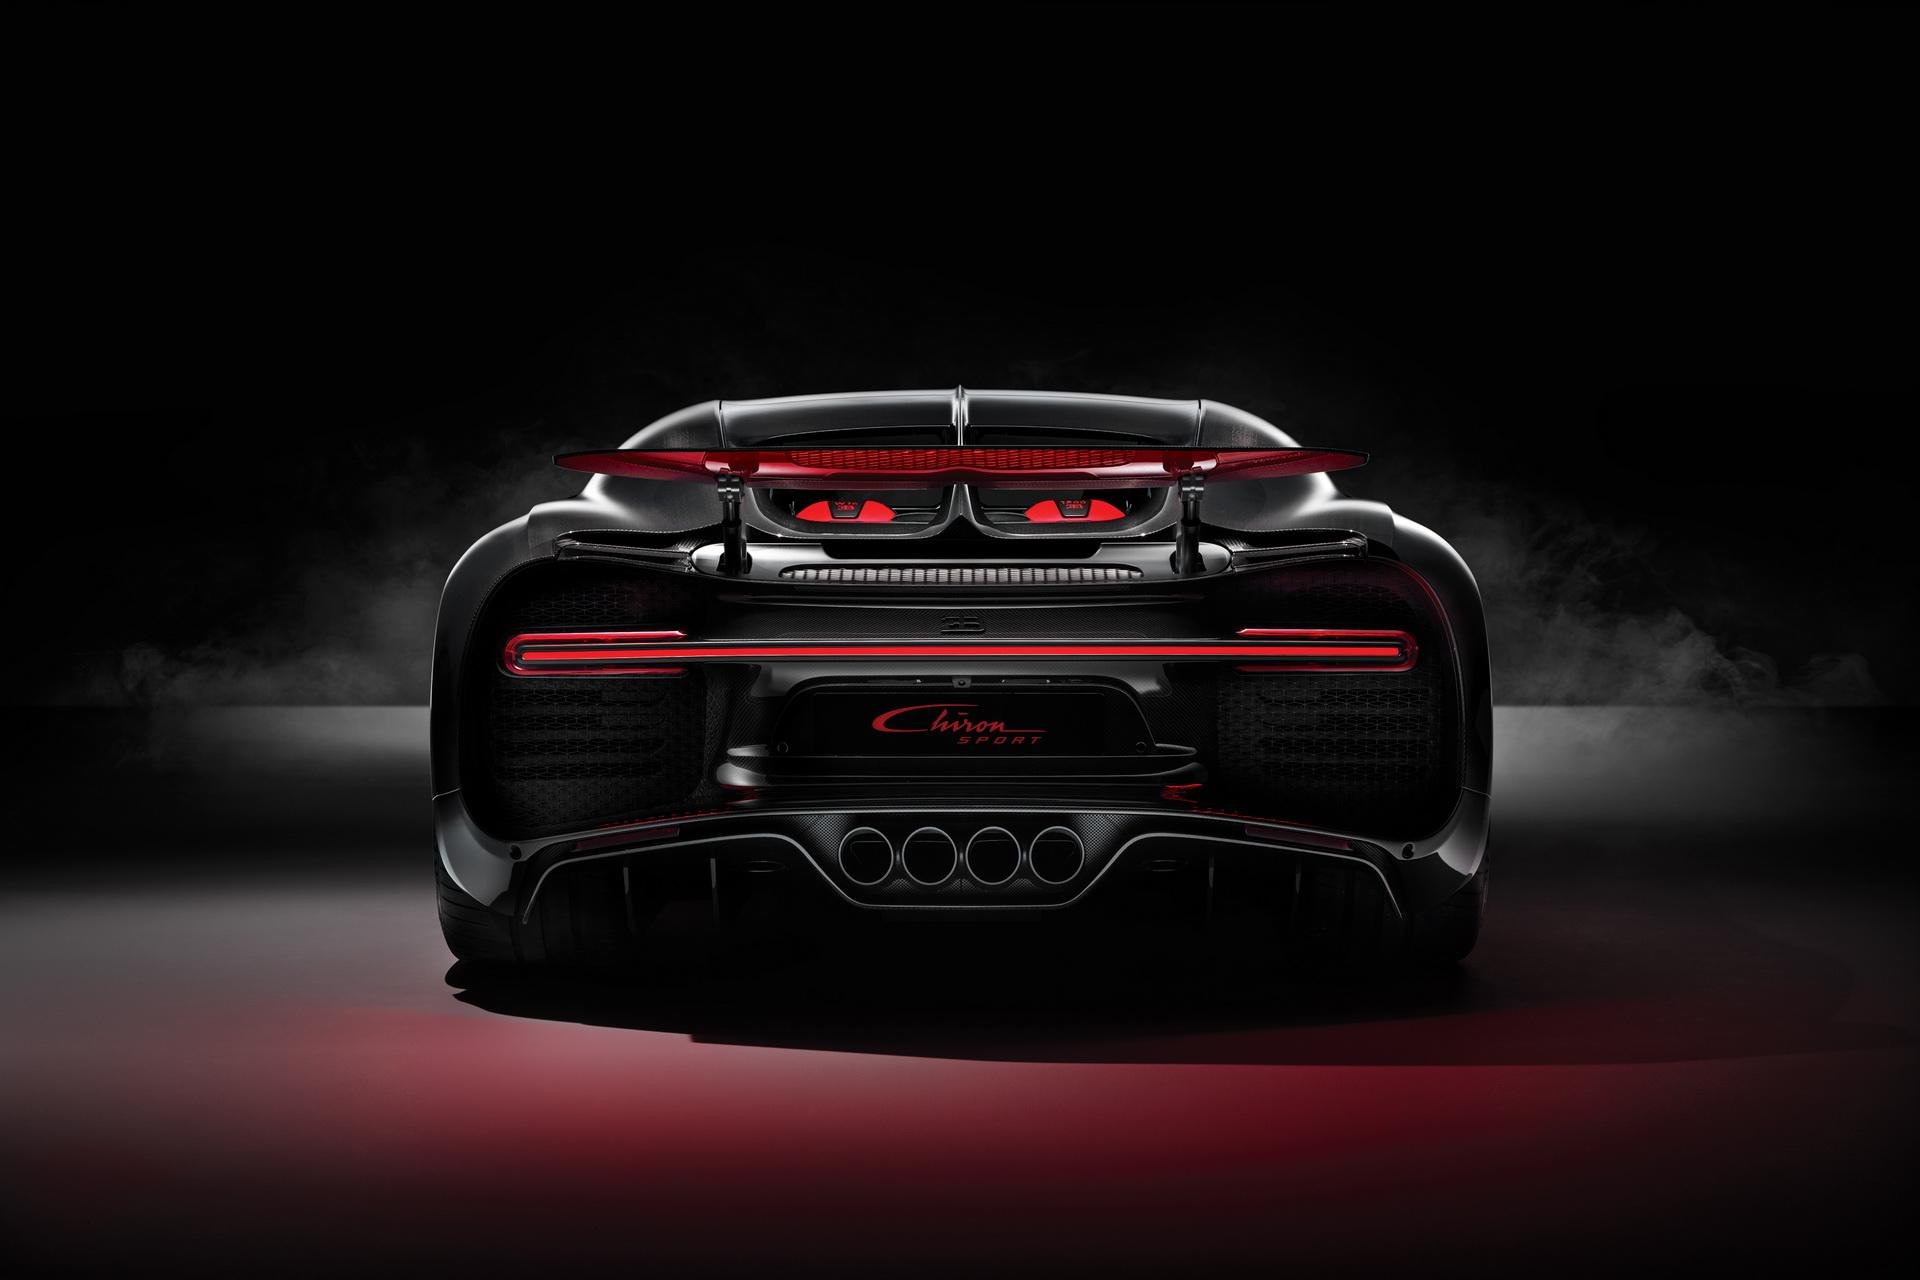 2018-bugatti-chiron-sport-4